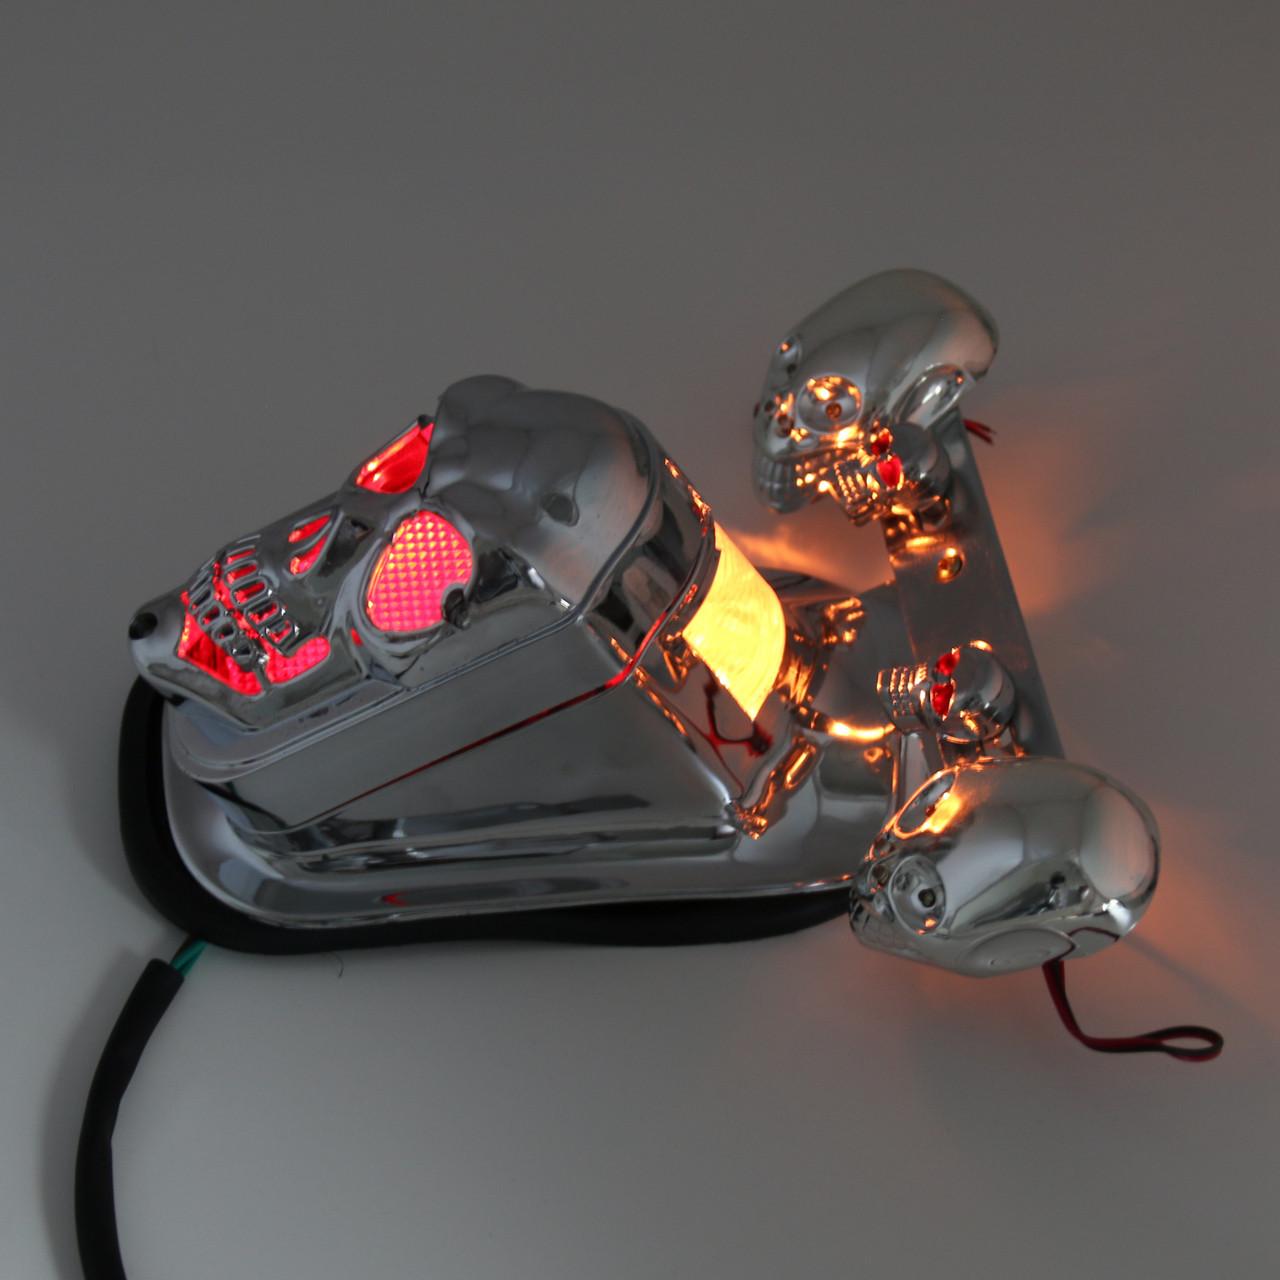 Skull Tail Light Rear Indicators Turn Signals License Tag Bracket Set Harley Davidson, Chrome, Blue LED Indicators